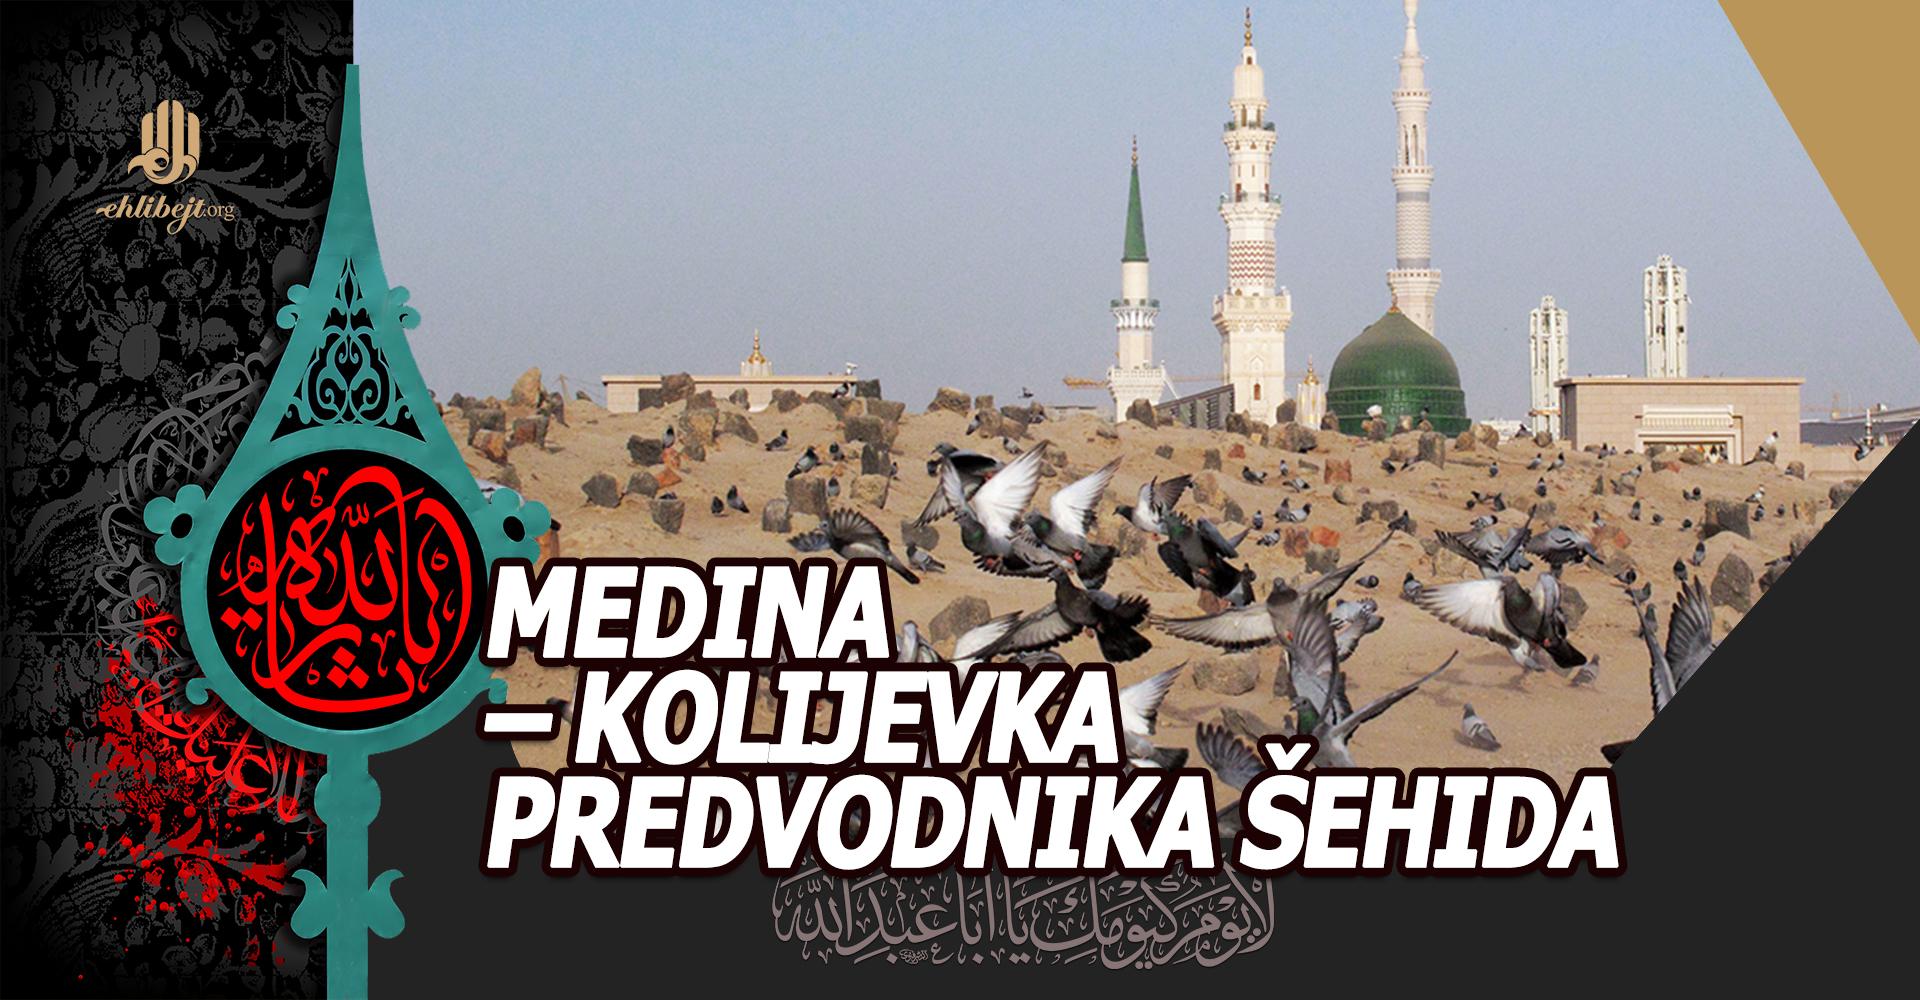 Medina – kolijevka predvodnika šehida